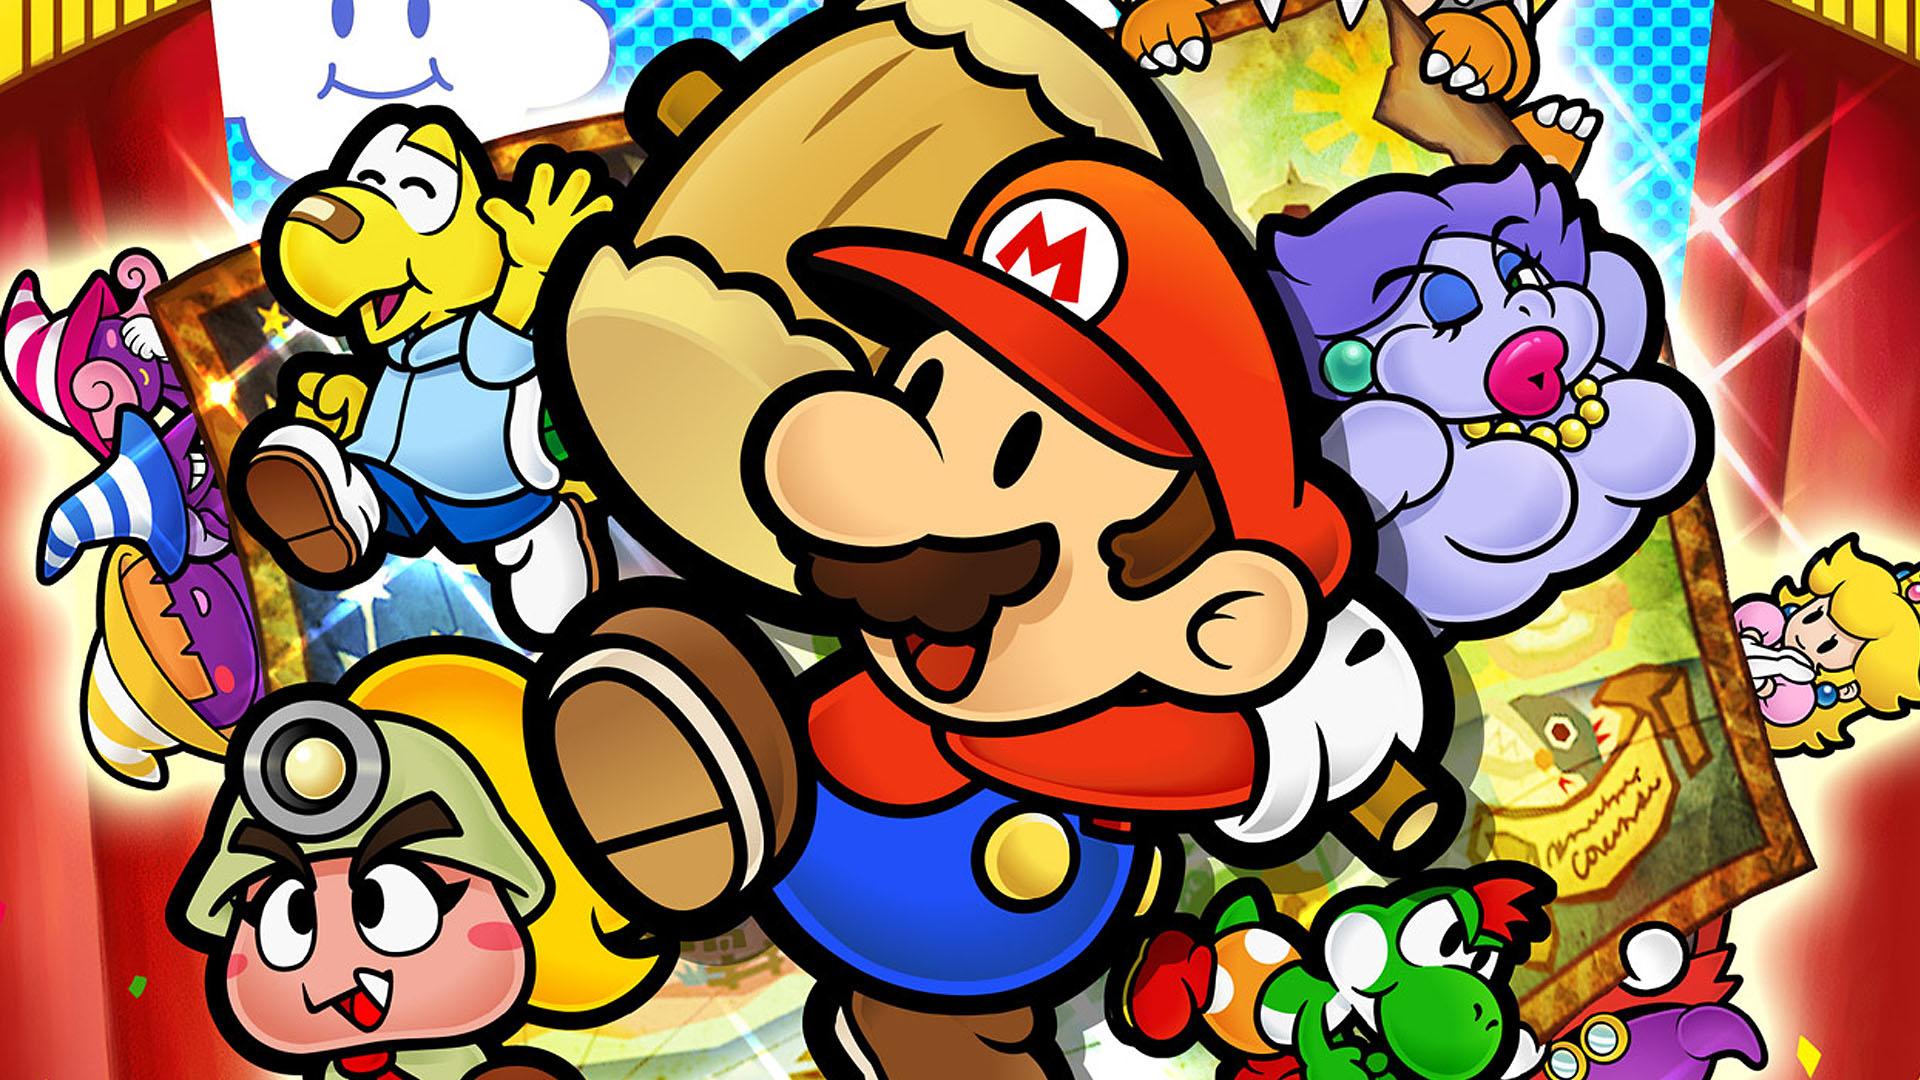 New Mario games coming in 2020 - Paper Mario